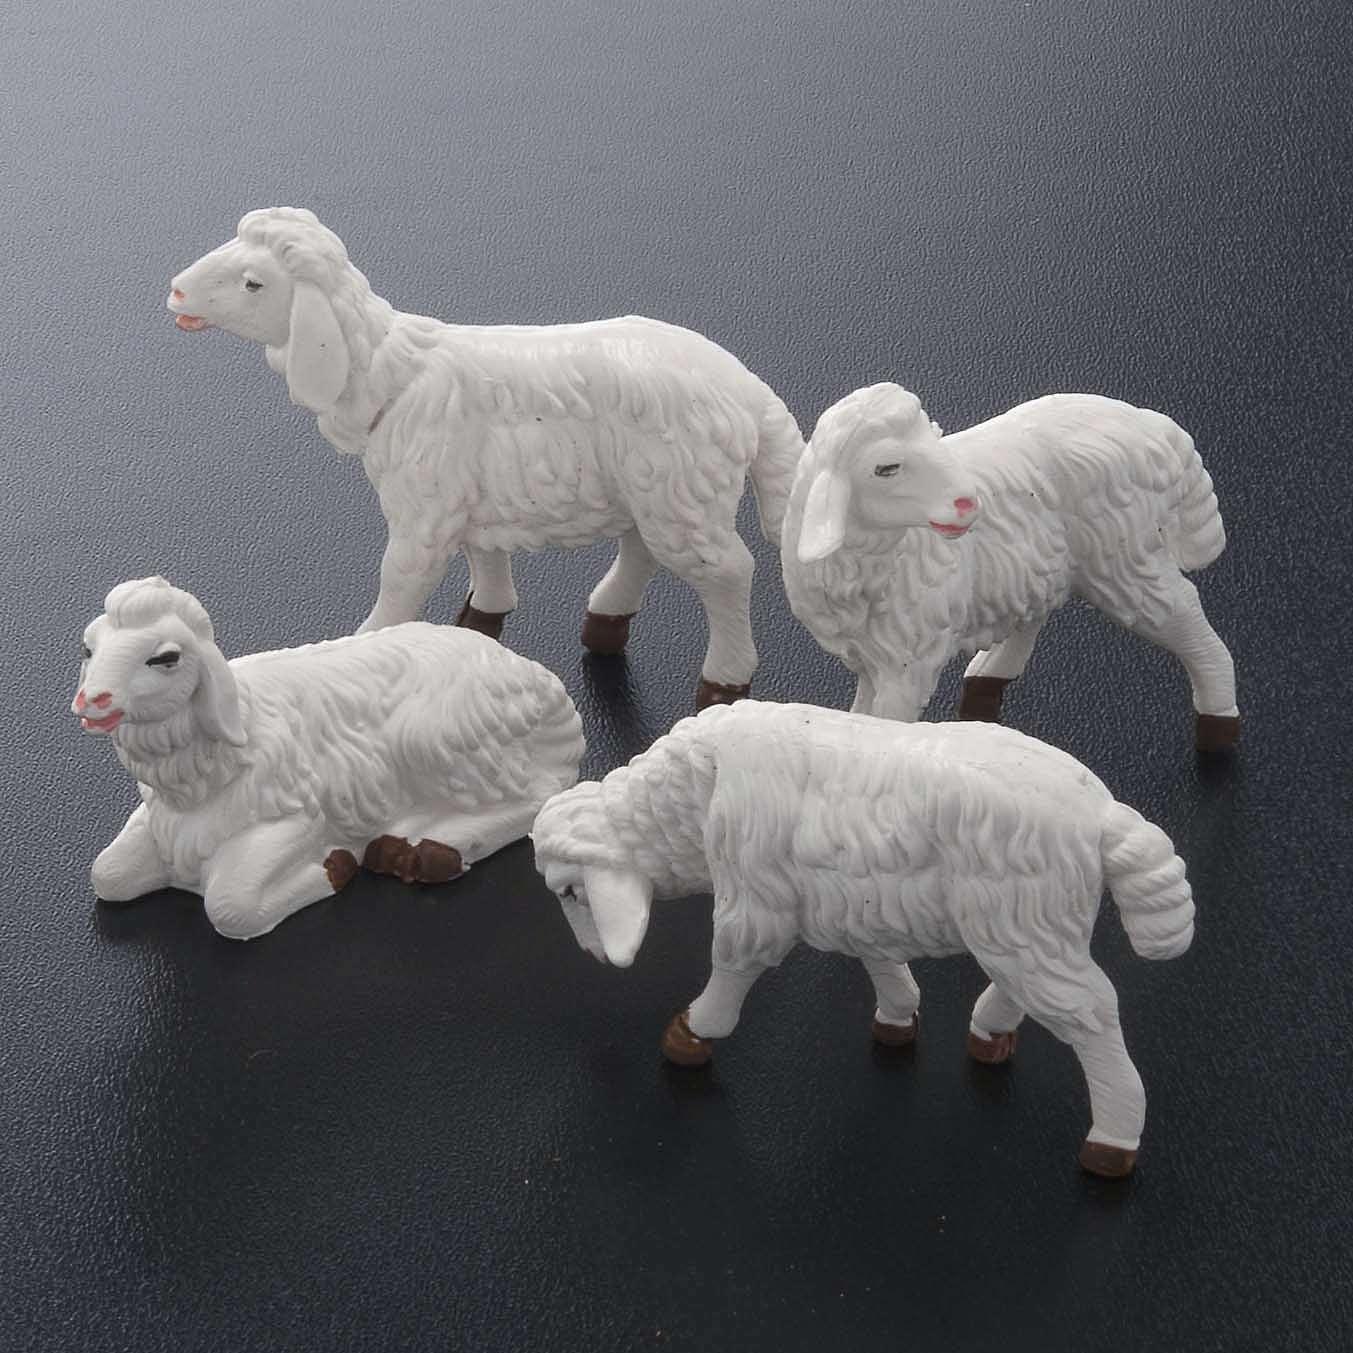 Pecore presepe plastica bianca 4 pz. 12 cm 3